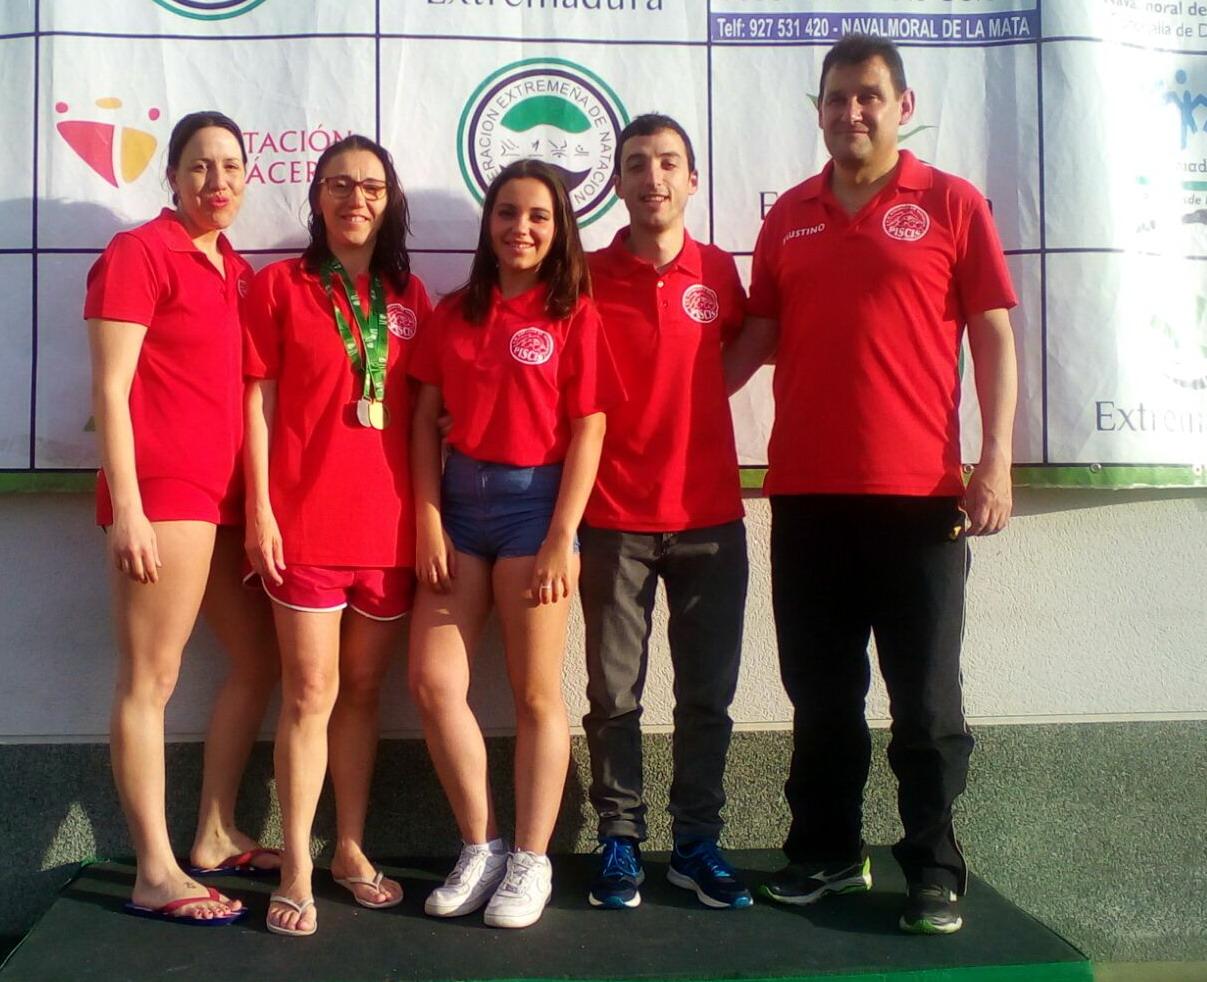 Escuela de natacion piscis campeonato de extremadura master for Piscina climatizada navalmoral